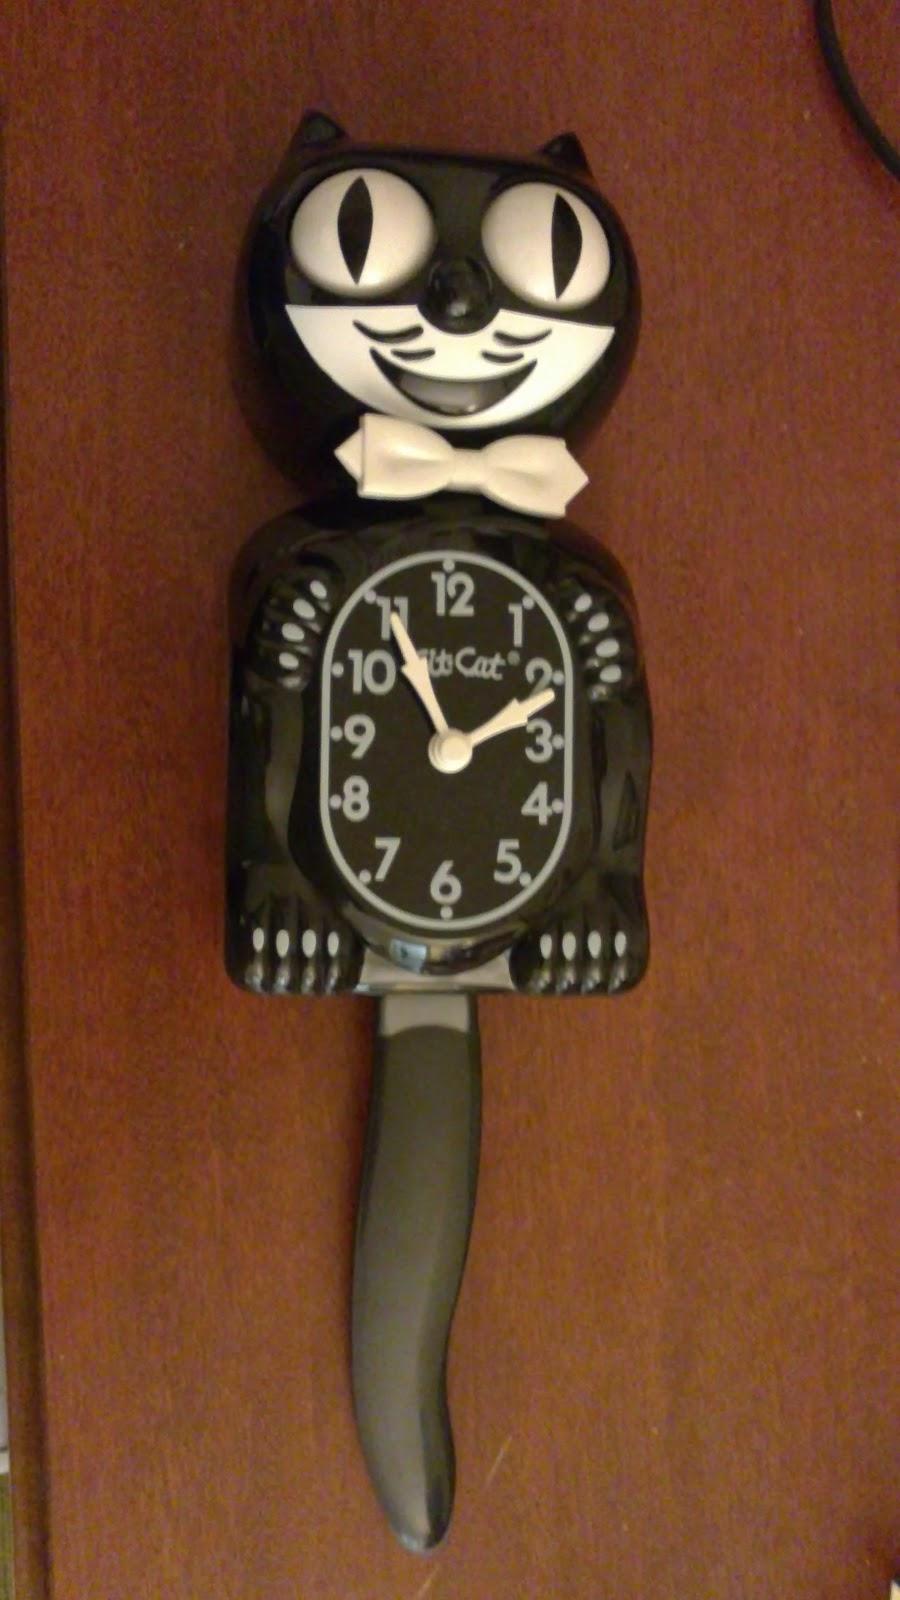 Hope 39 S Cafe Sgsg Kit Cat Clock Review